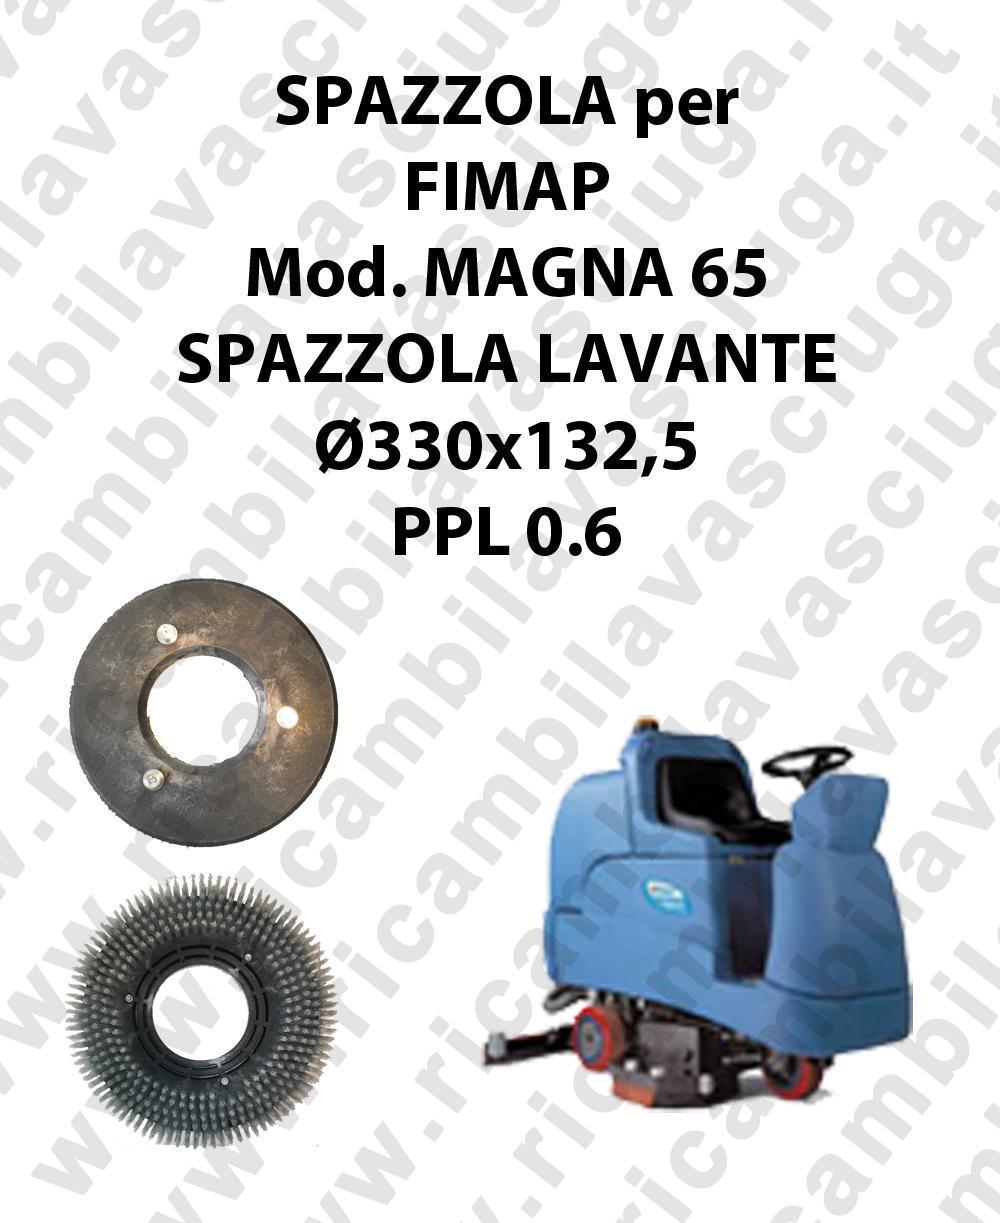 STANDARD BRUSH  for scrubber dryer FIMAP model MAGNA 65 ⌀ 330 x 132.5 PPL 0.6